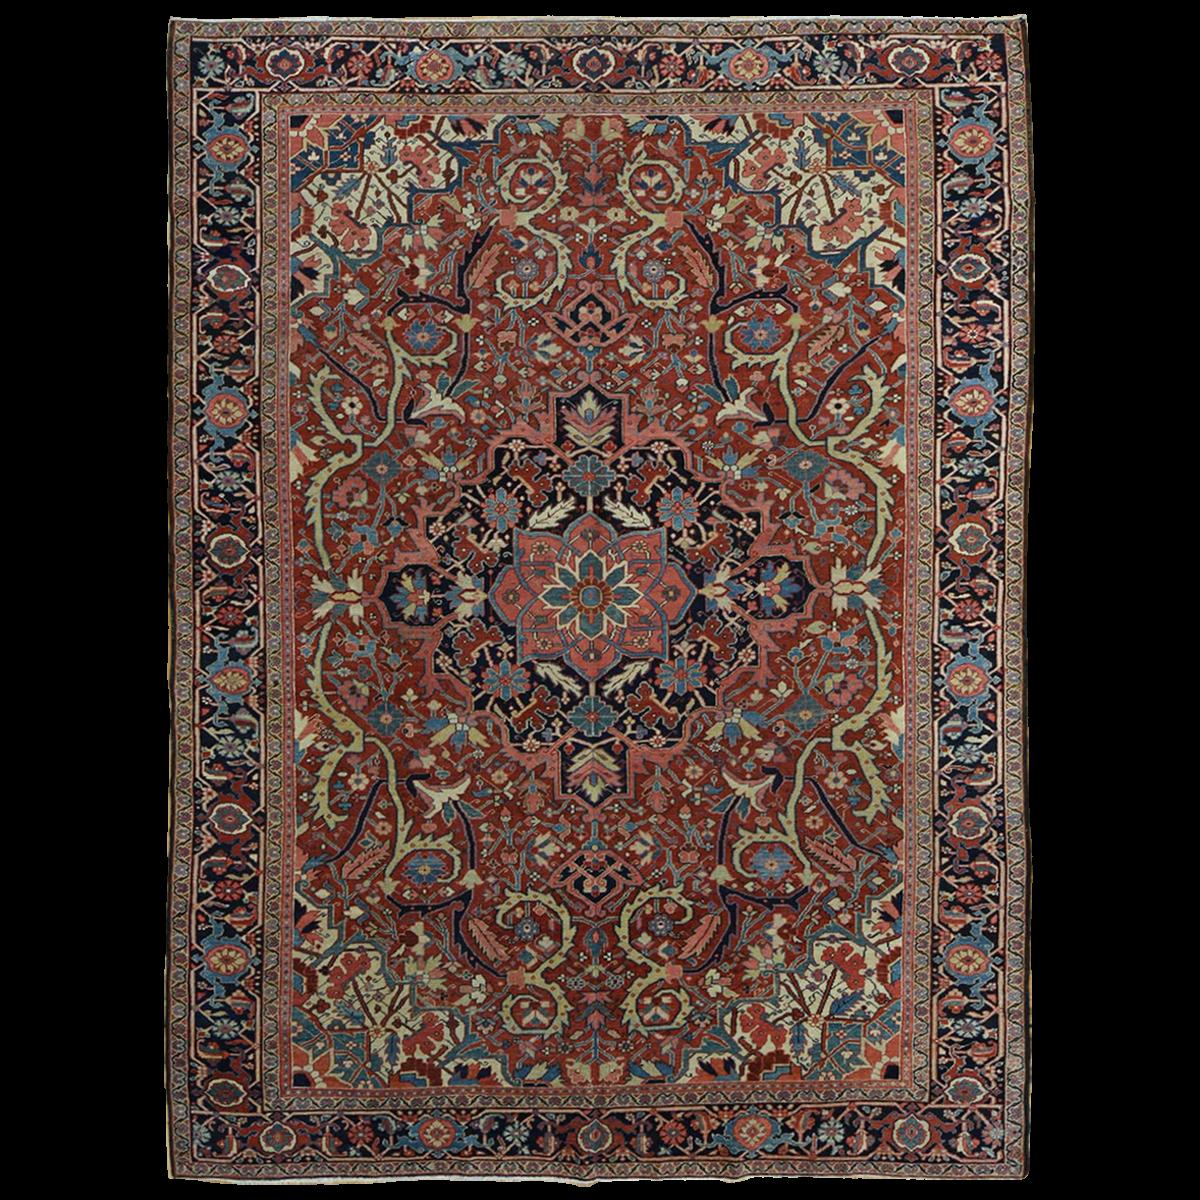 100/% Wool Carpet Runner Runners Kitchen Runner Oriental Persian Ruby Red